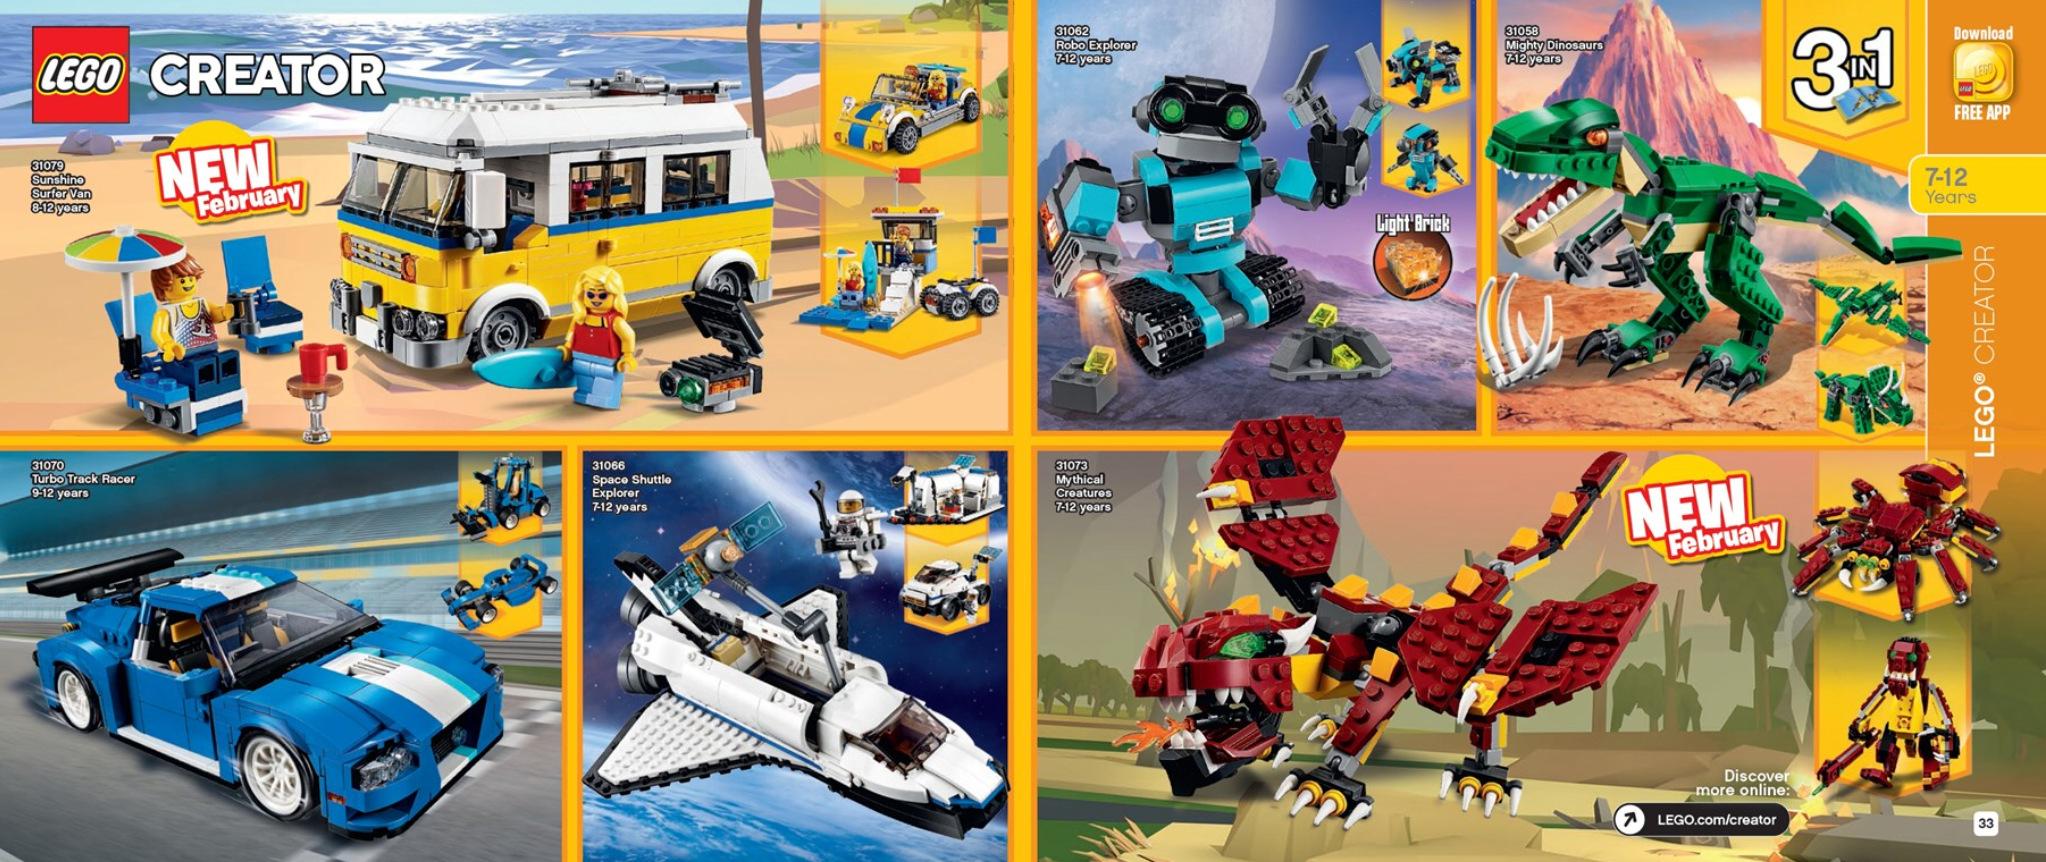 Brick Builder Lego Creator Expert